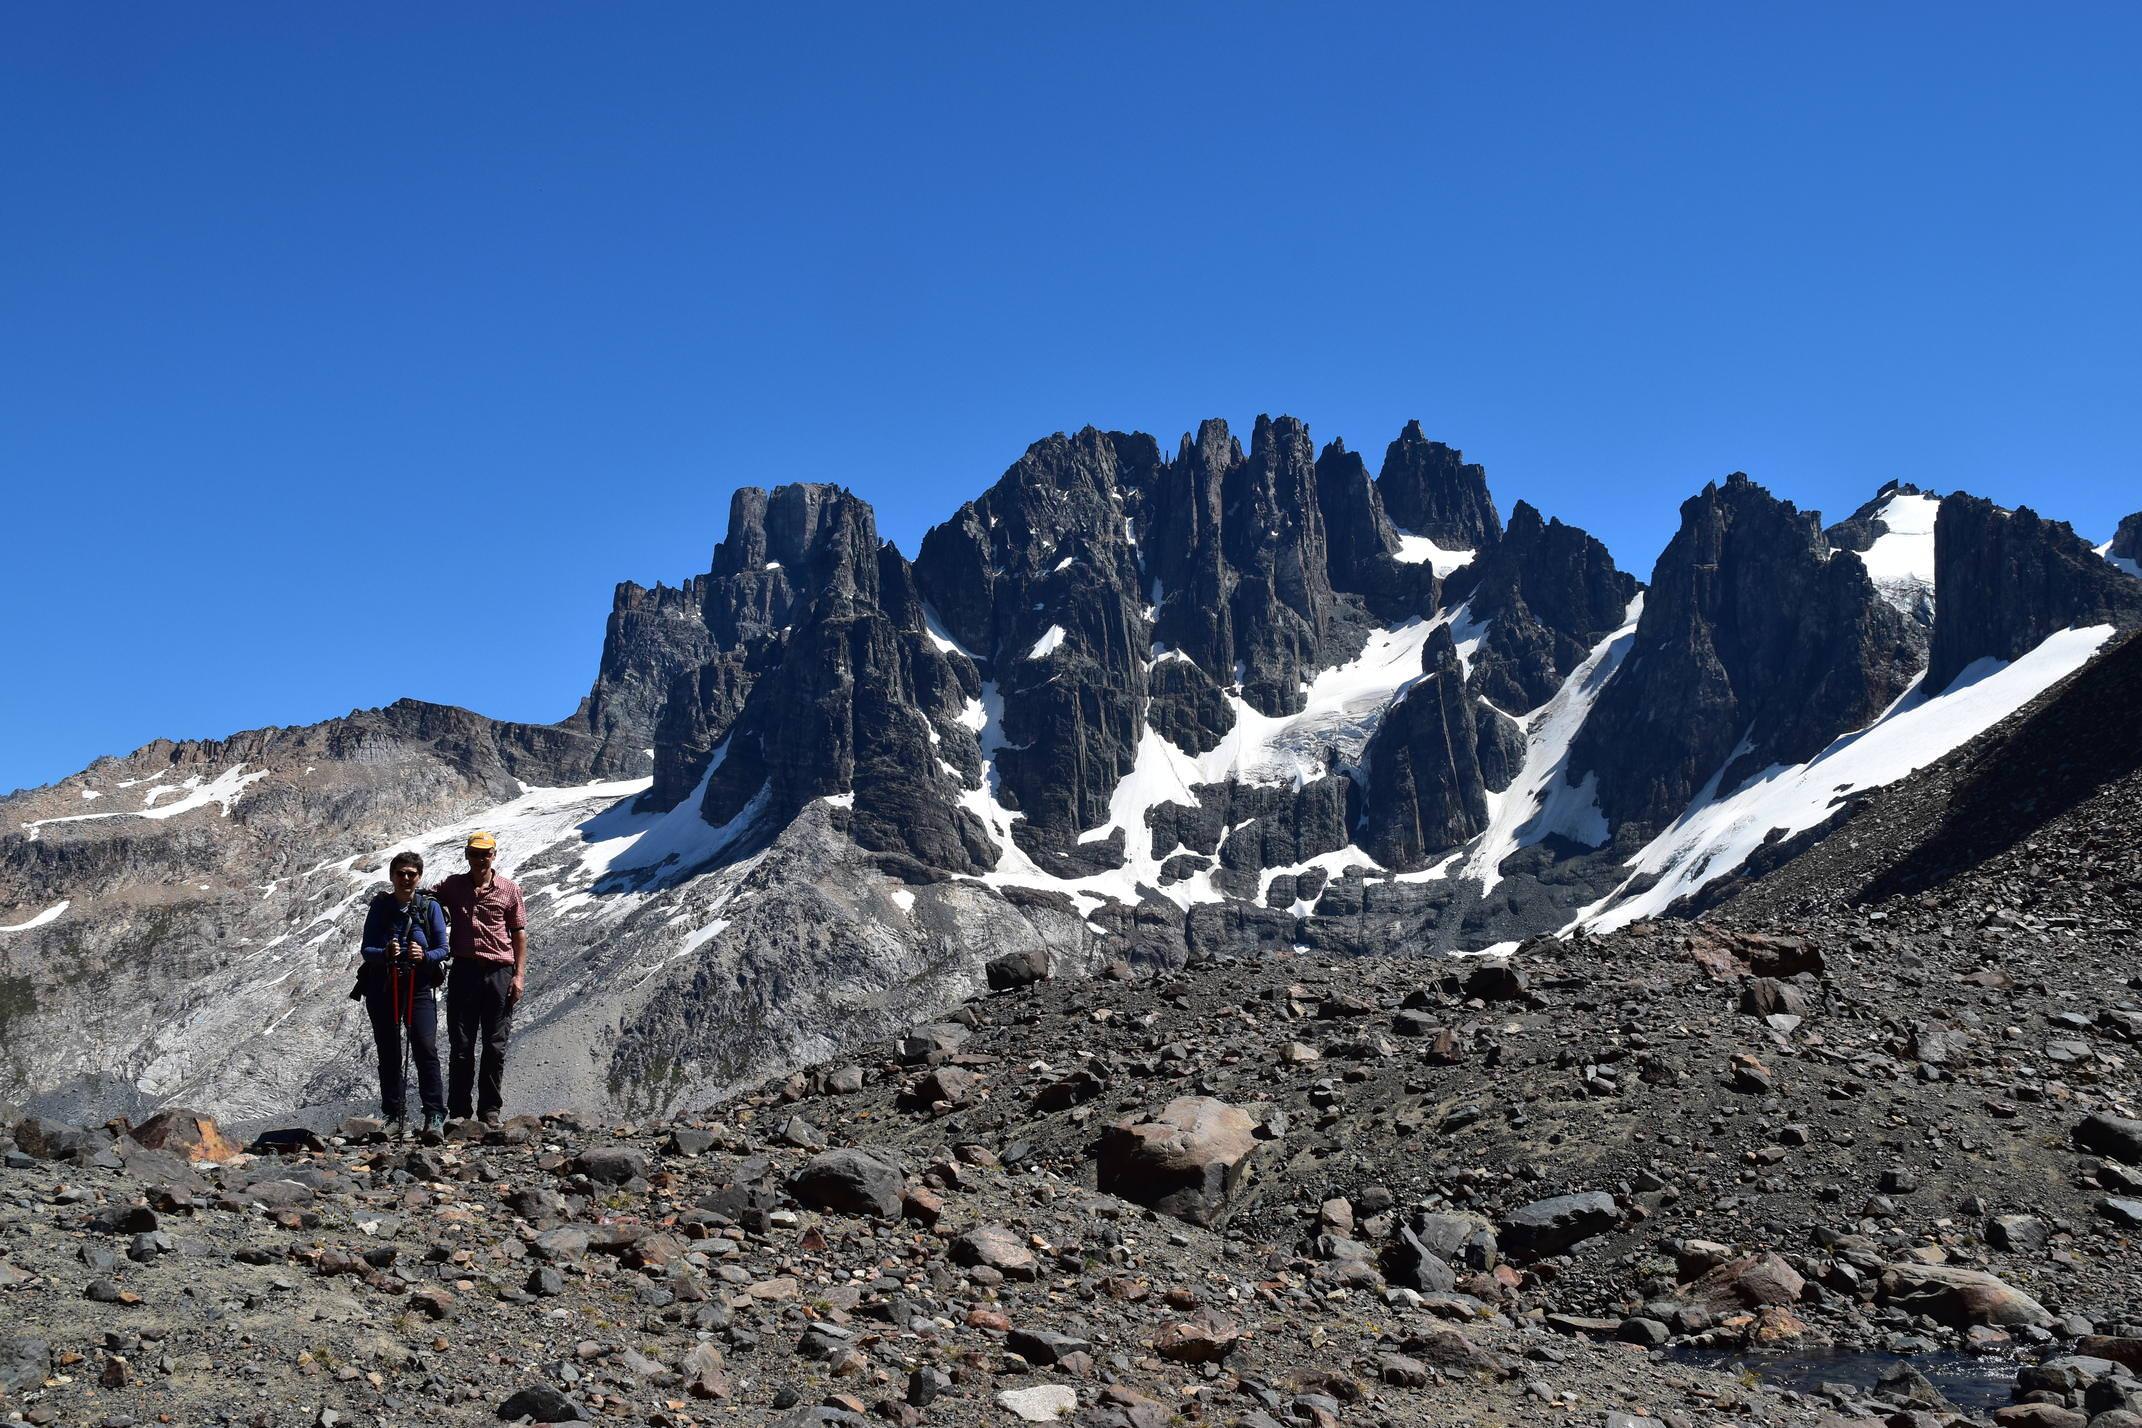 Chile carretera cerro castill hike copyright john main